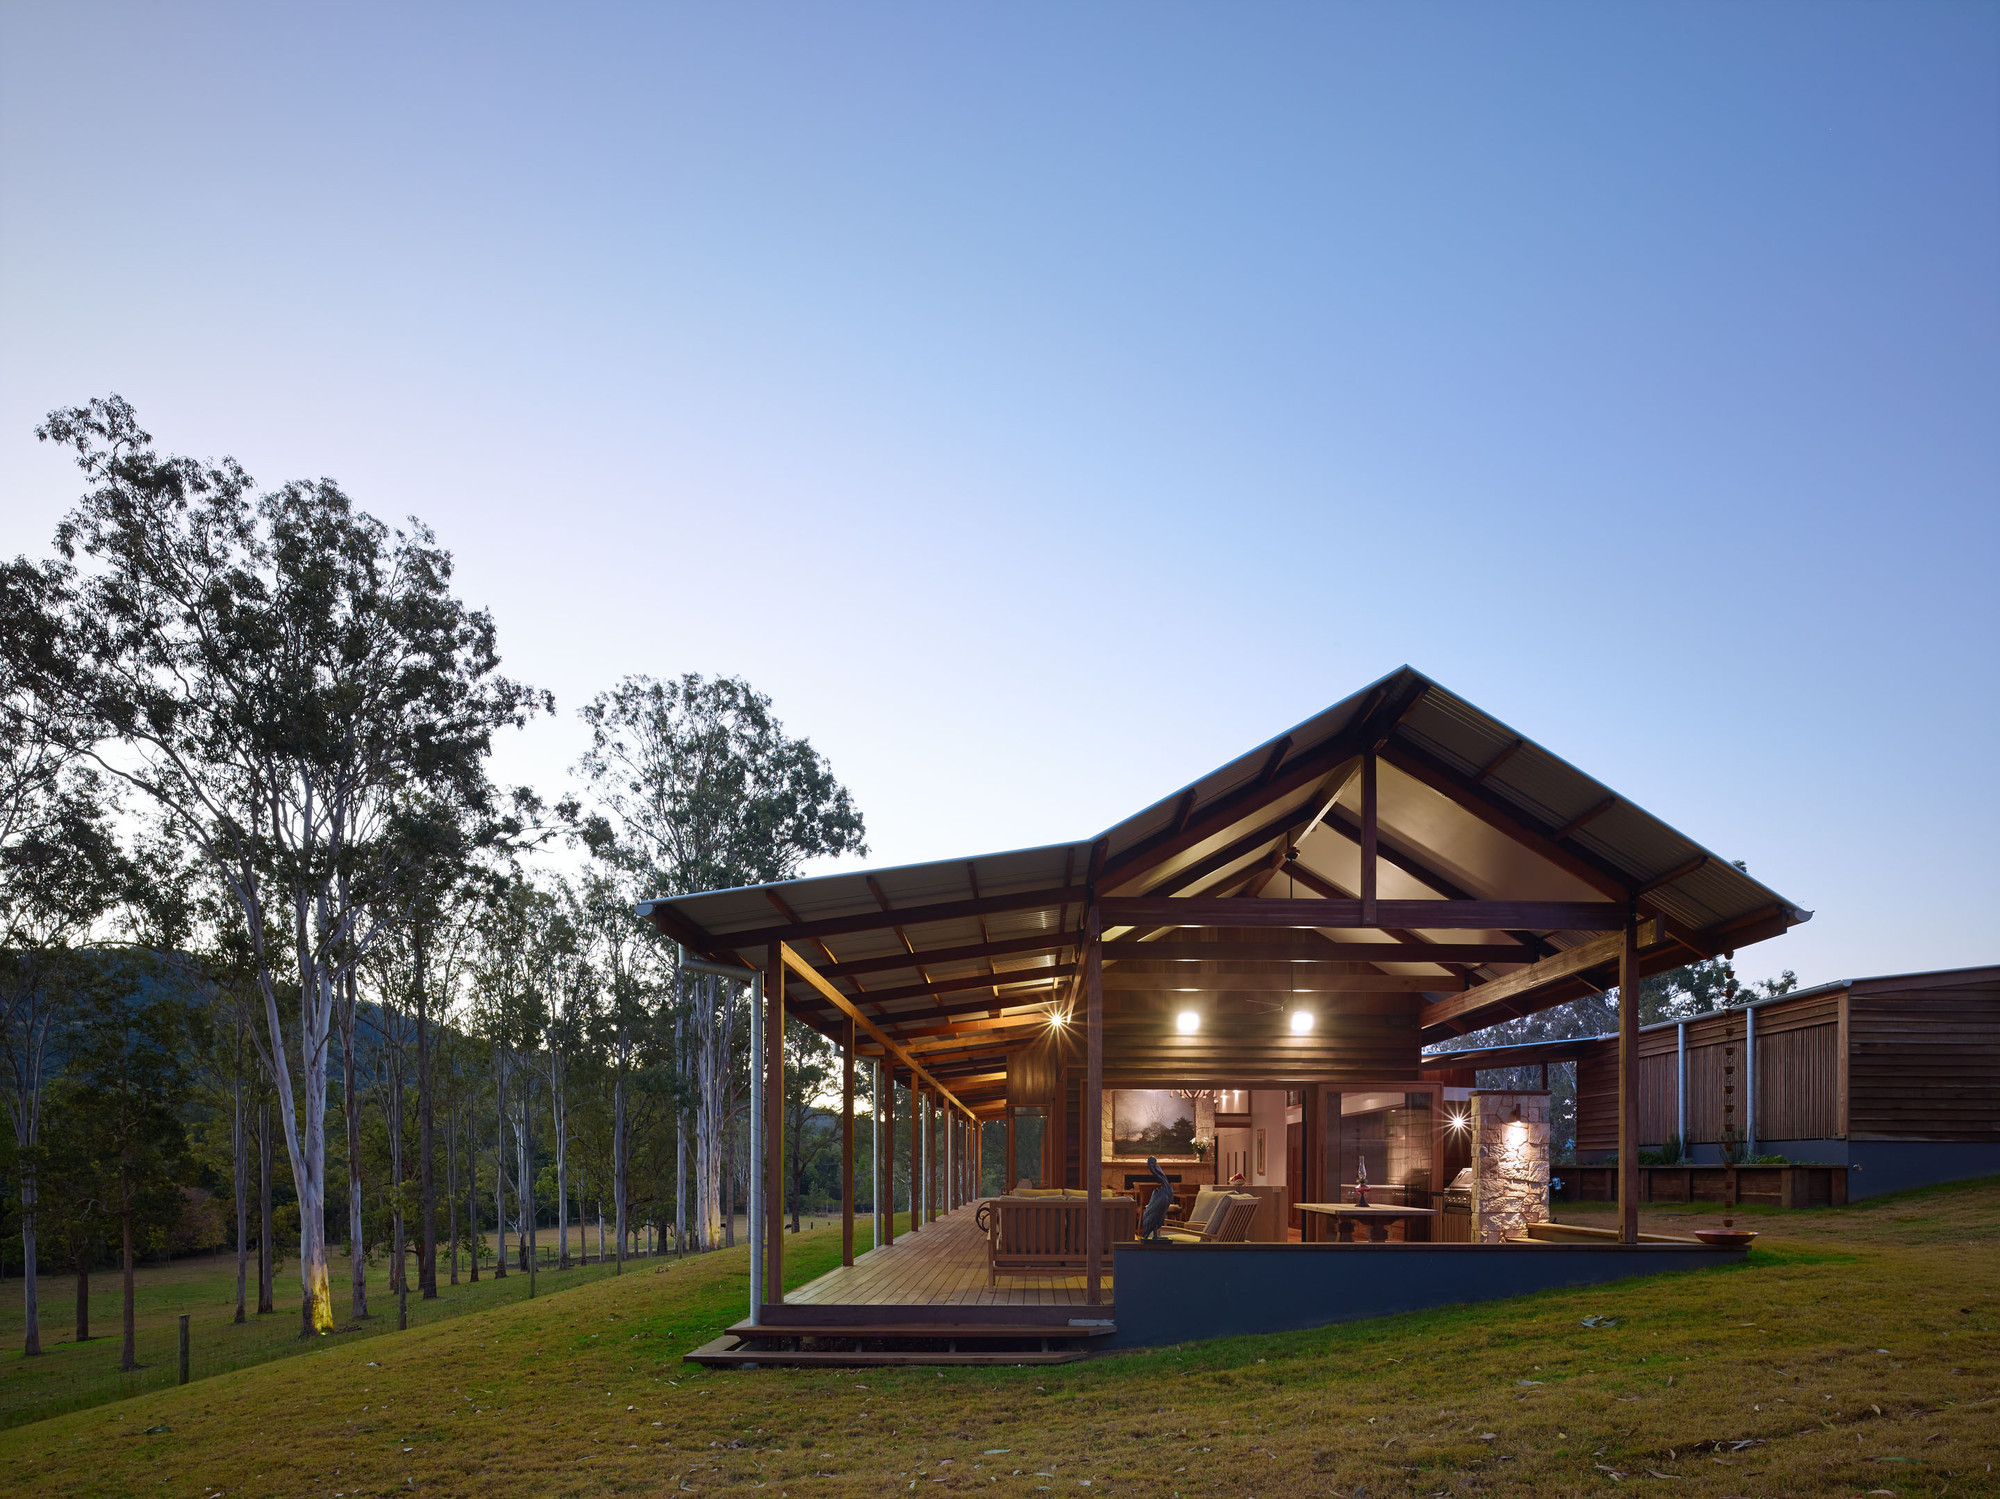 Casa Hinterland / Shaun Lockyer Architects, © Scott Burrows Photography